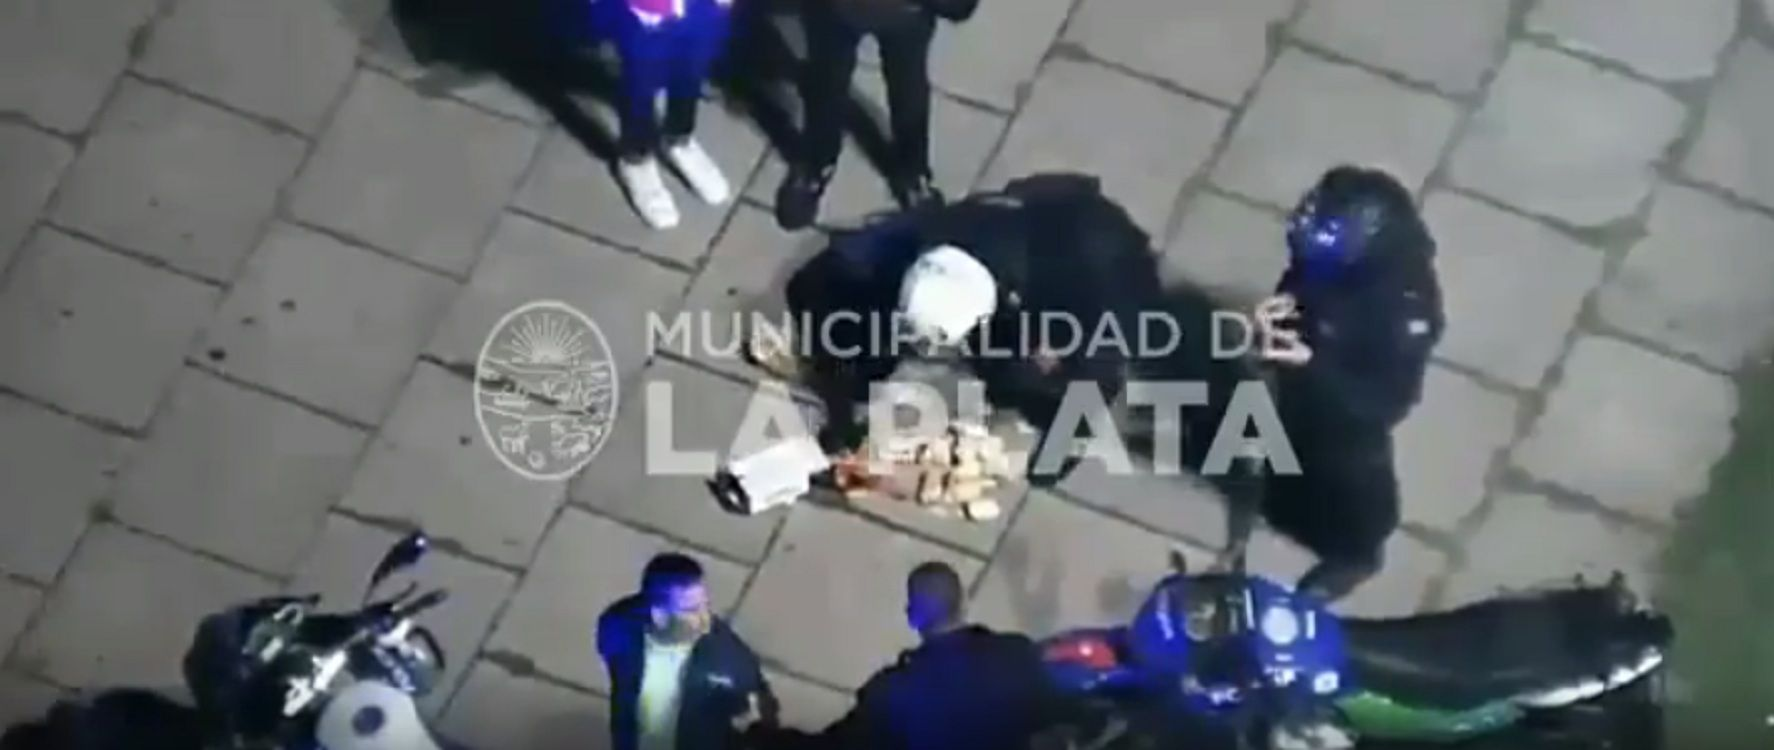 Así detuvieron a Omar Díaz el acusado de asesinar a Nadia Ferraresi